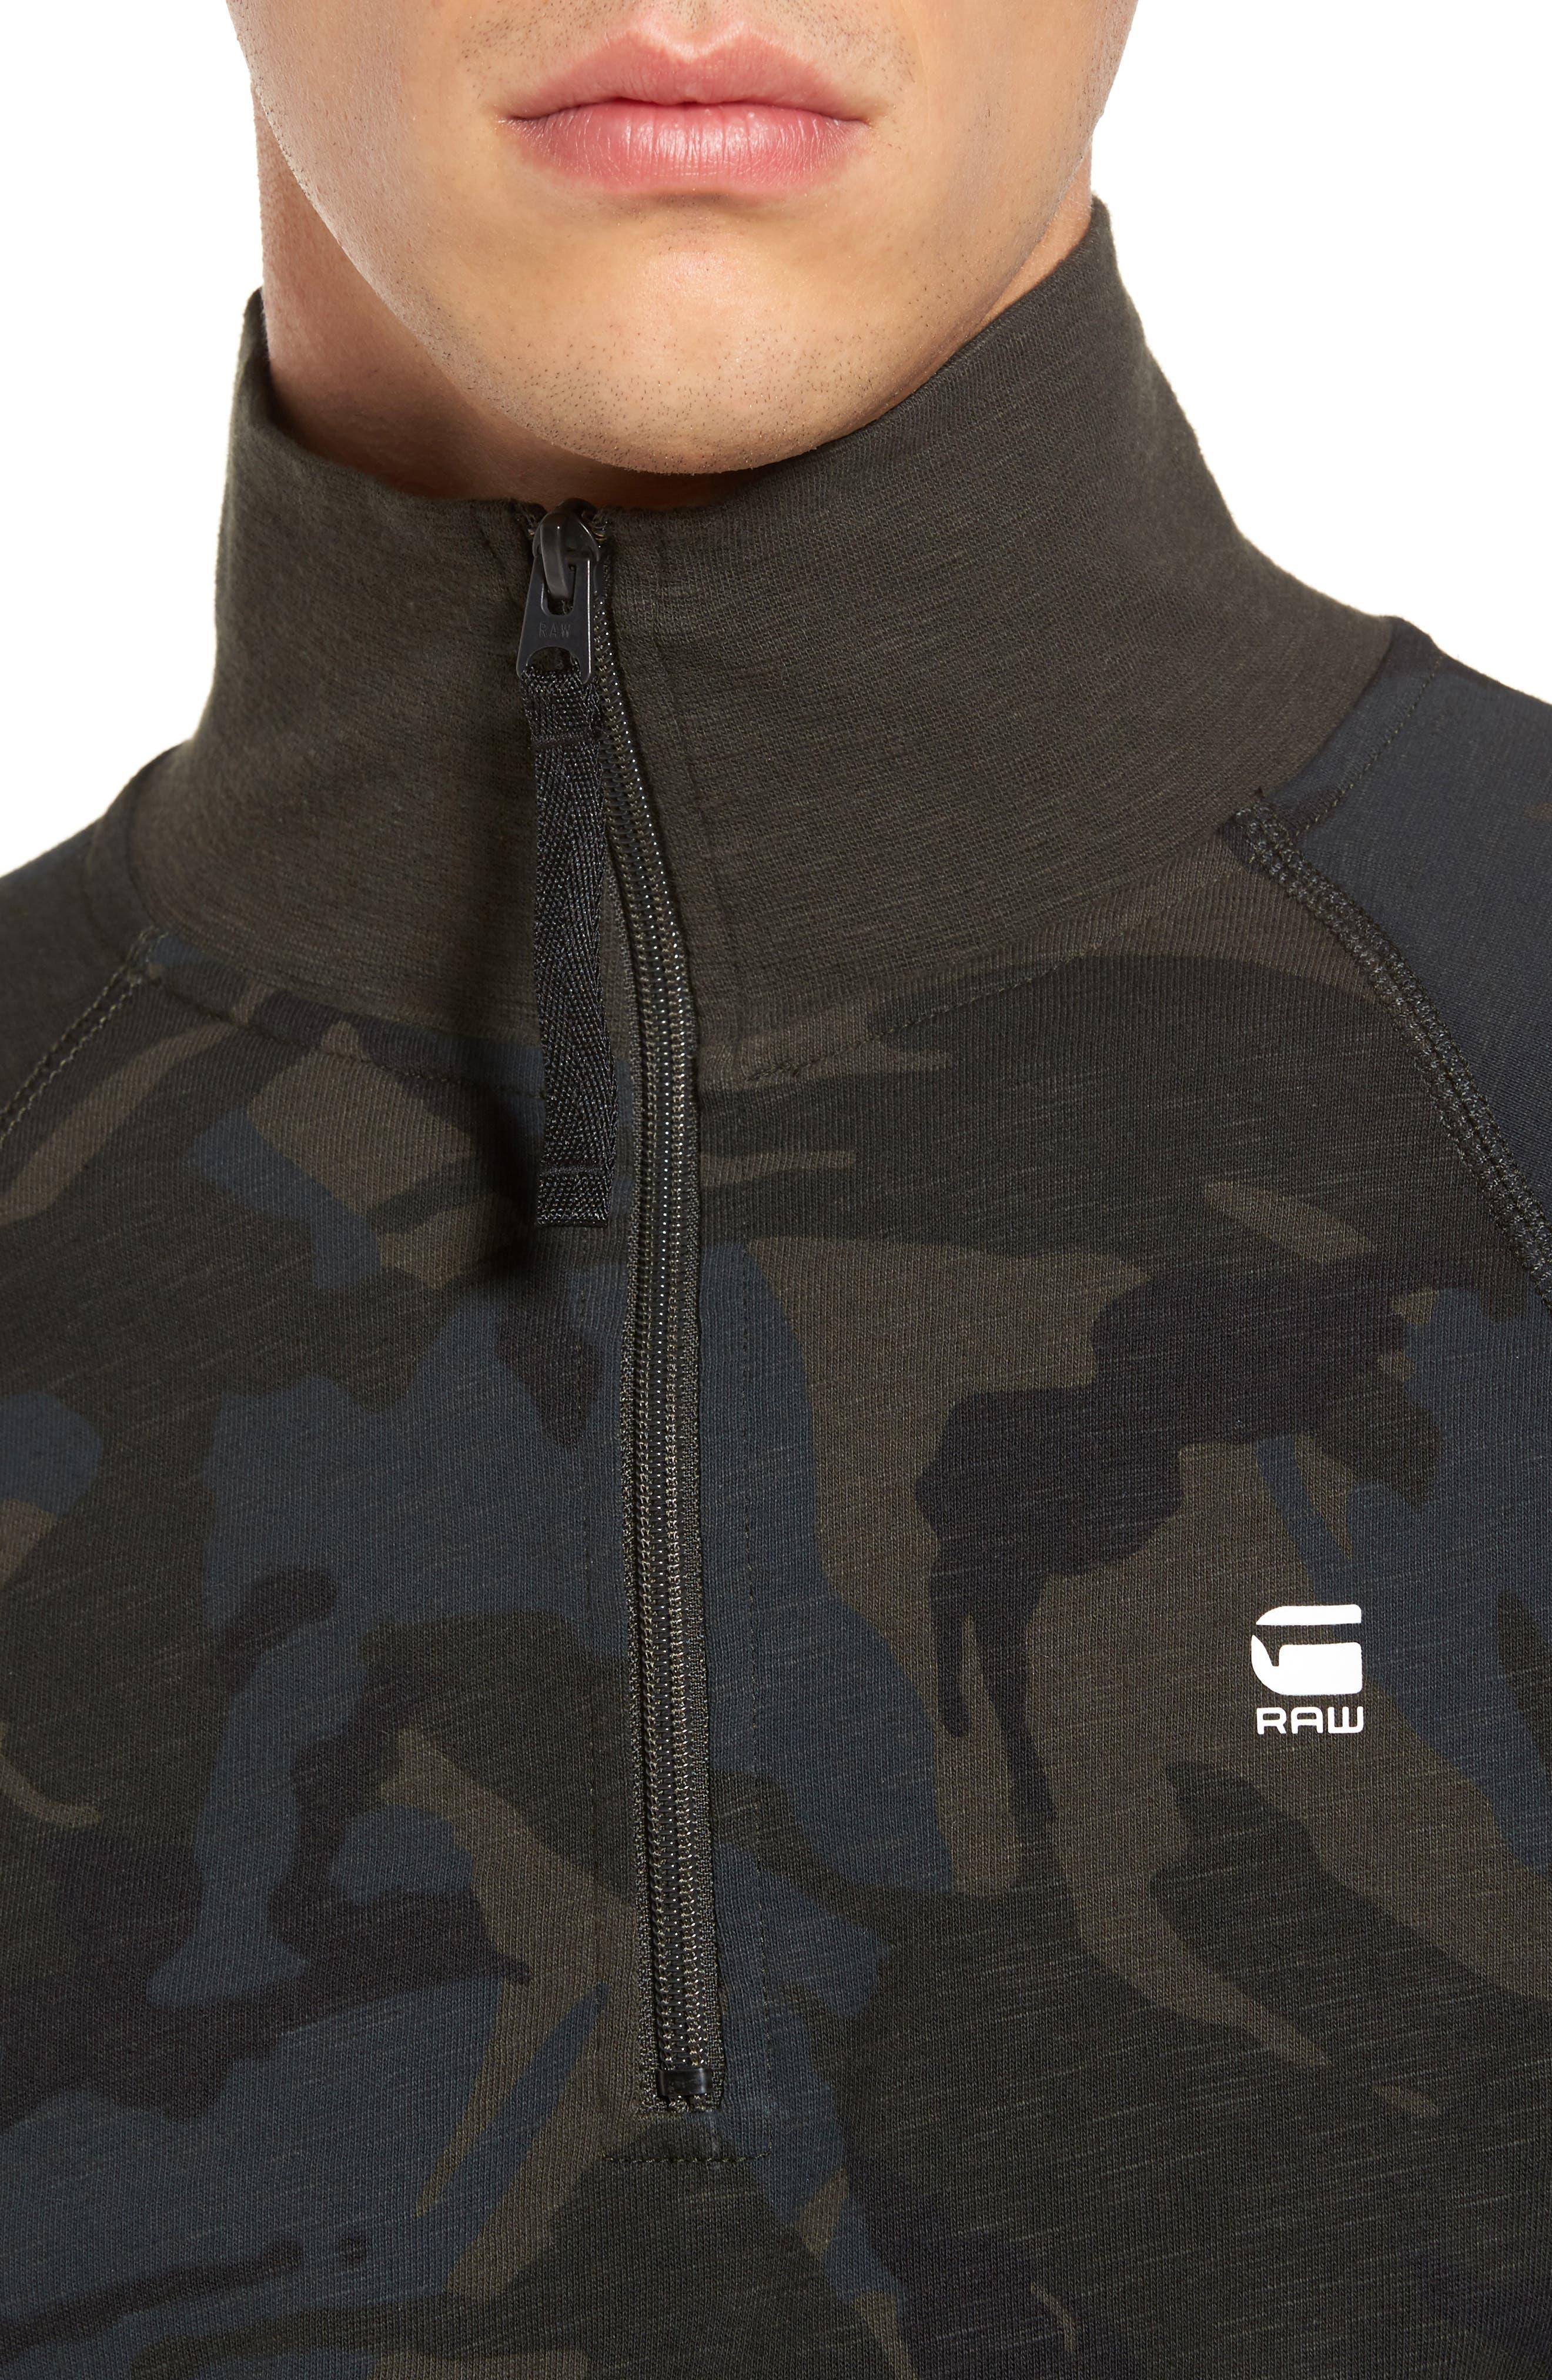 Jirgi Quarter Zip Jacket,                             Alternate thumbnail 4, color,                             Green